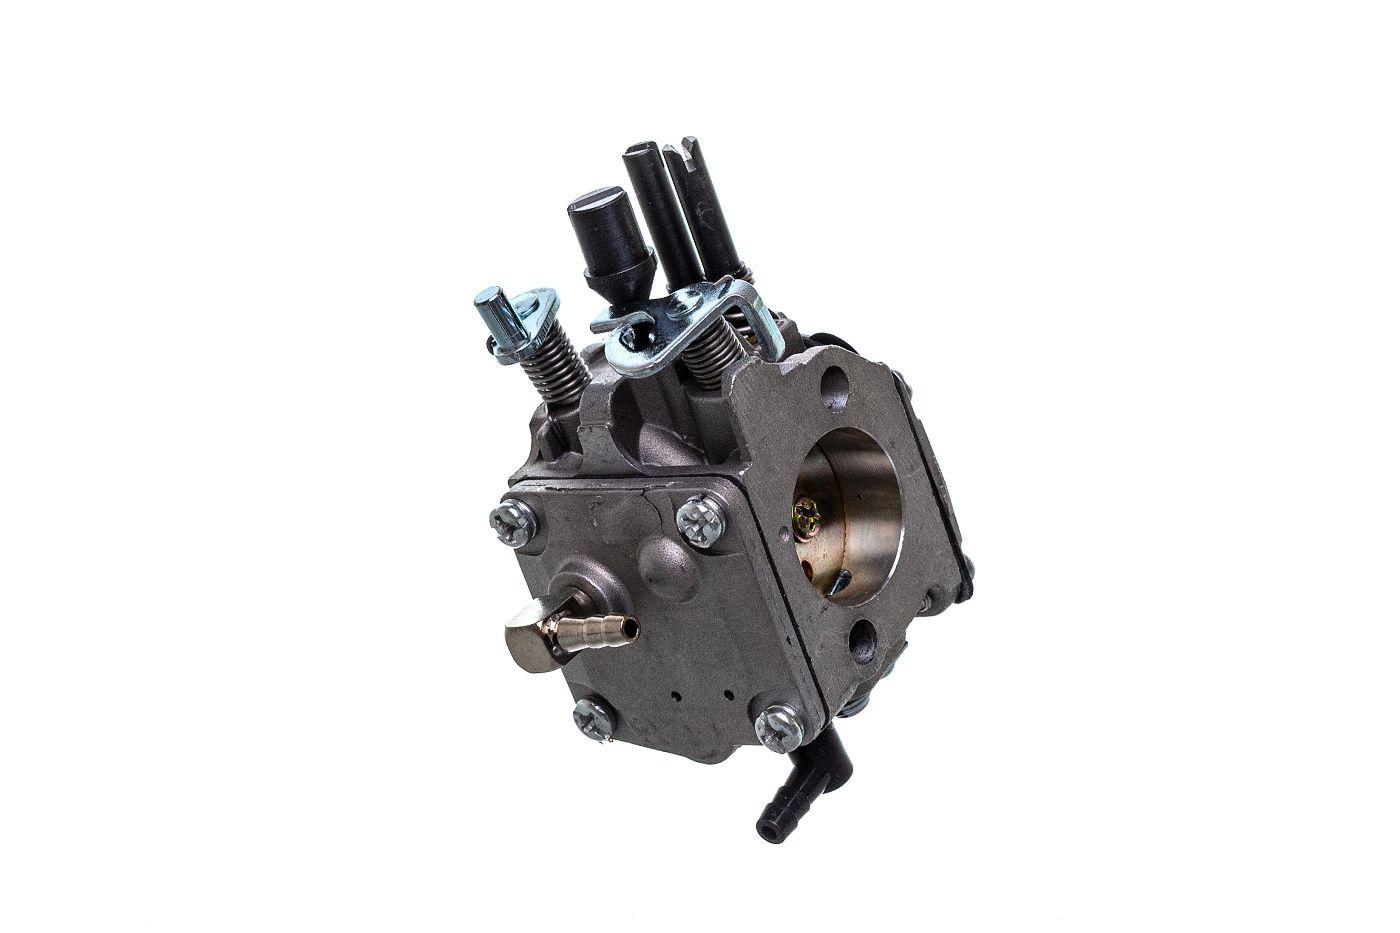 Karburátor Stihl MS650 MS660 066 WJ-67A (1122 120 0621)